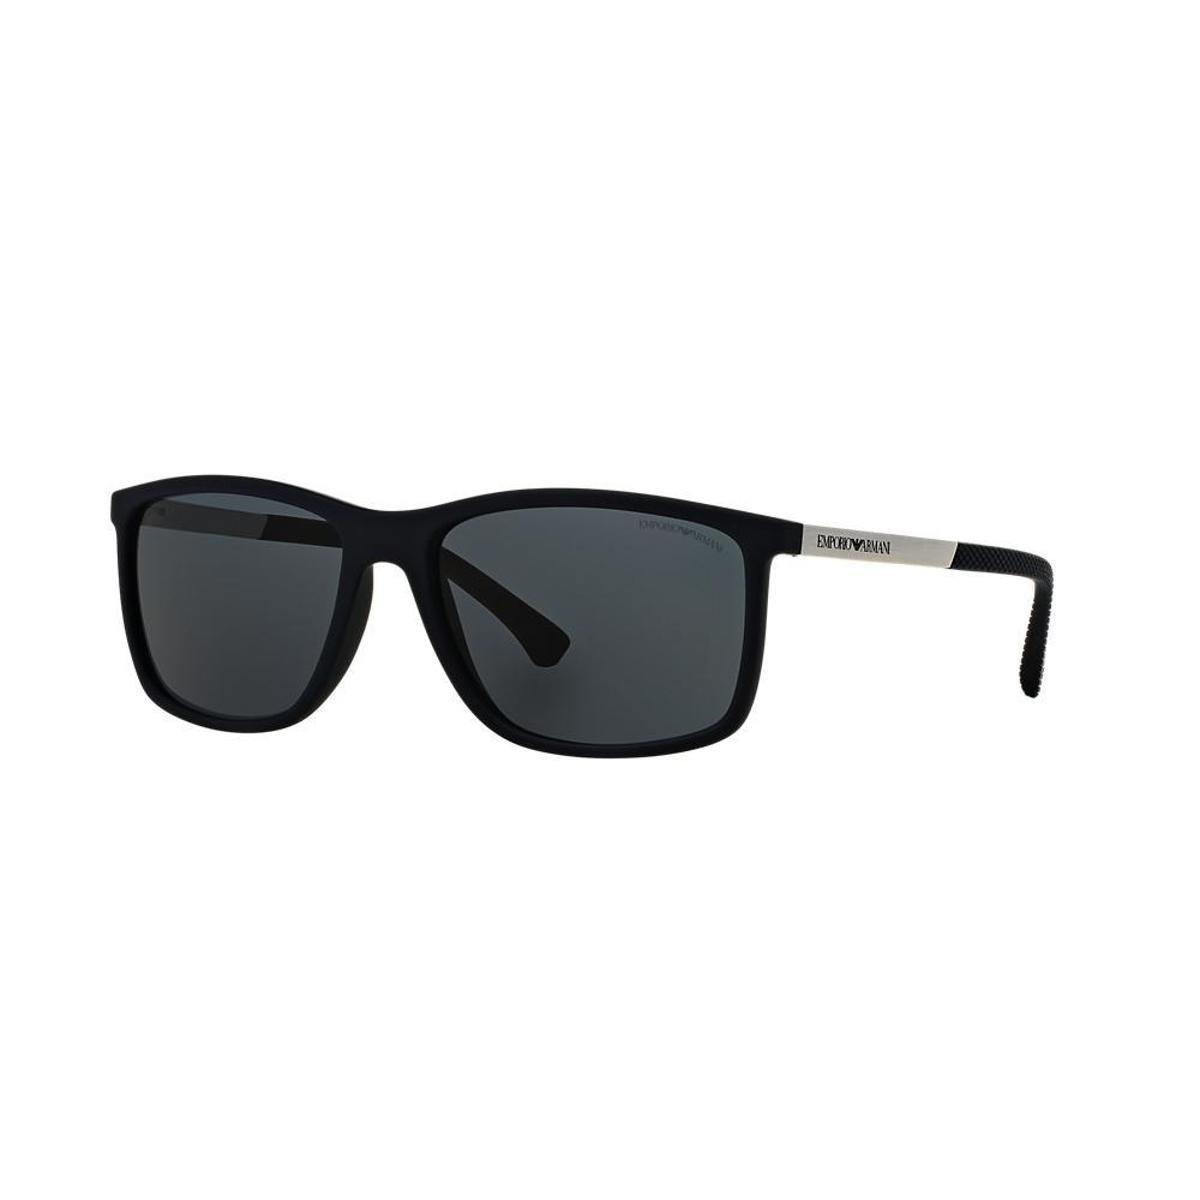 Óculos de Sol Emporio Armani Retangular EA4058 Feminino - Preto ... 90bbff5cb2